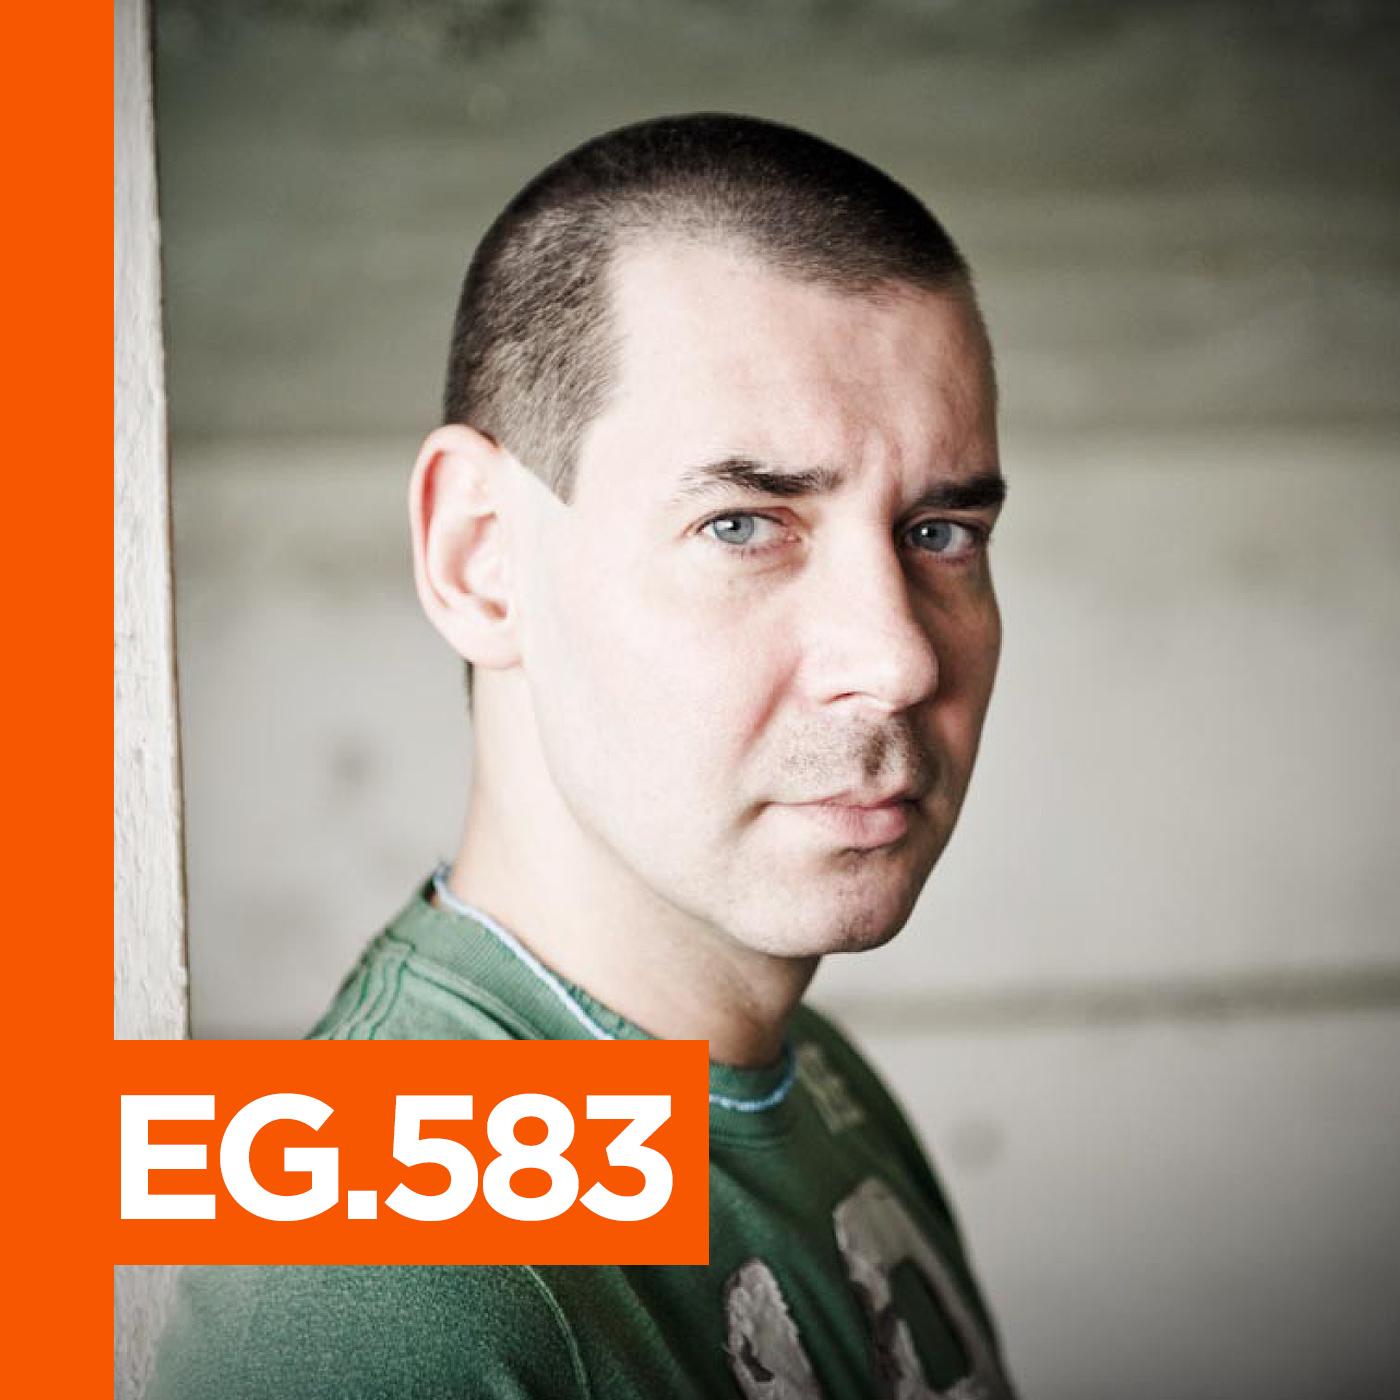 EG.583 Berny